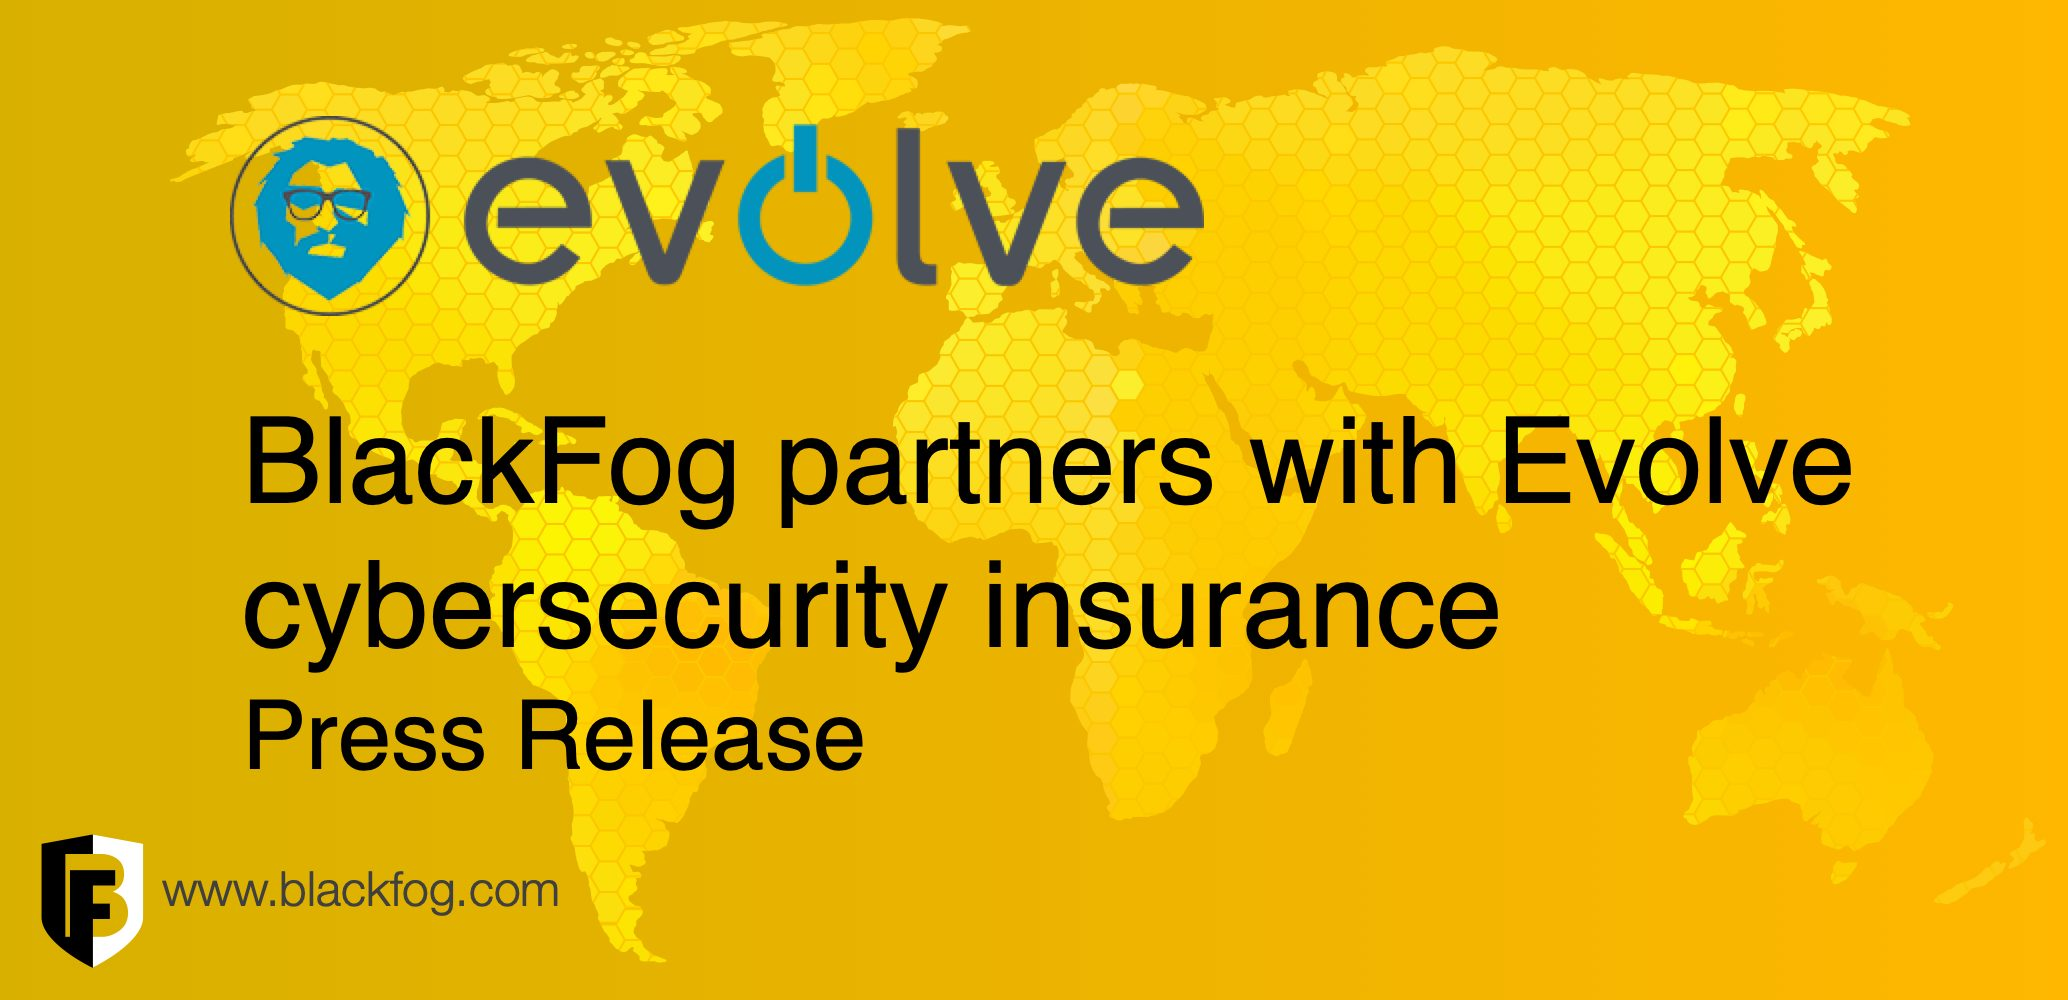 BlackFog Evolve Cybersecurity Insurance